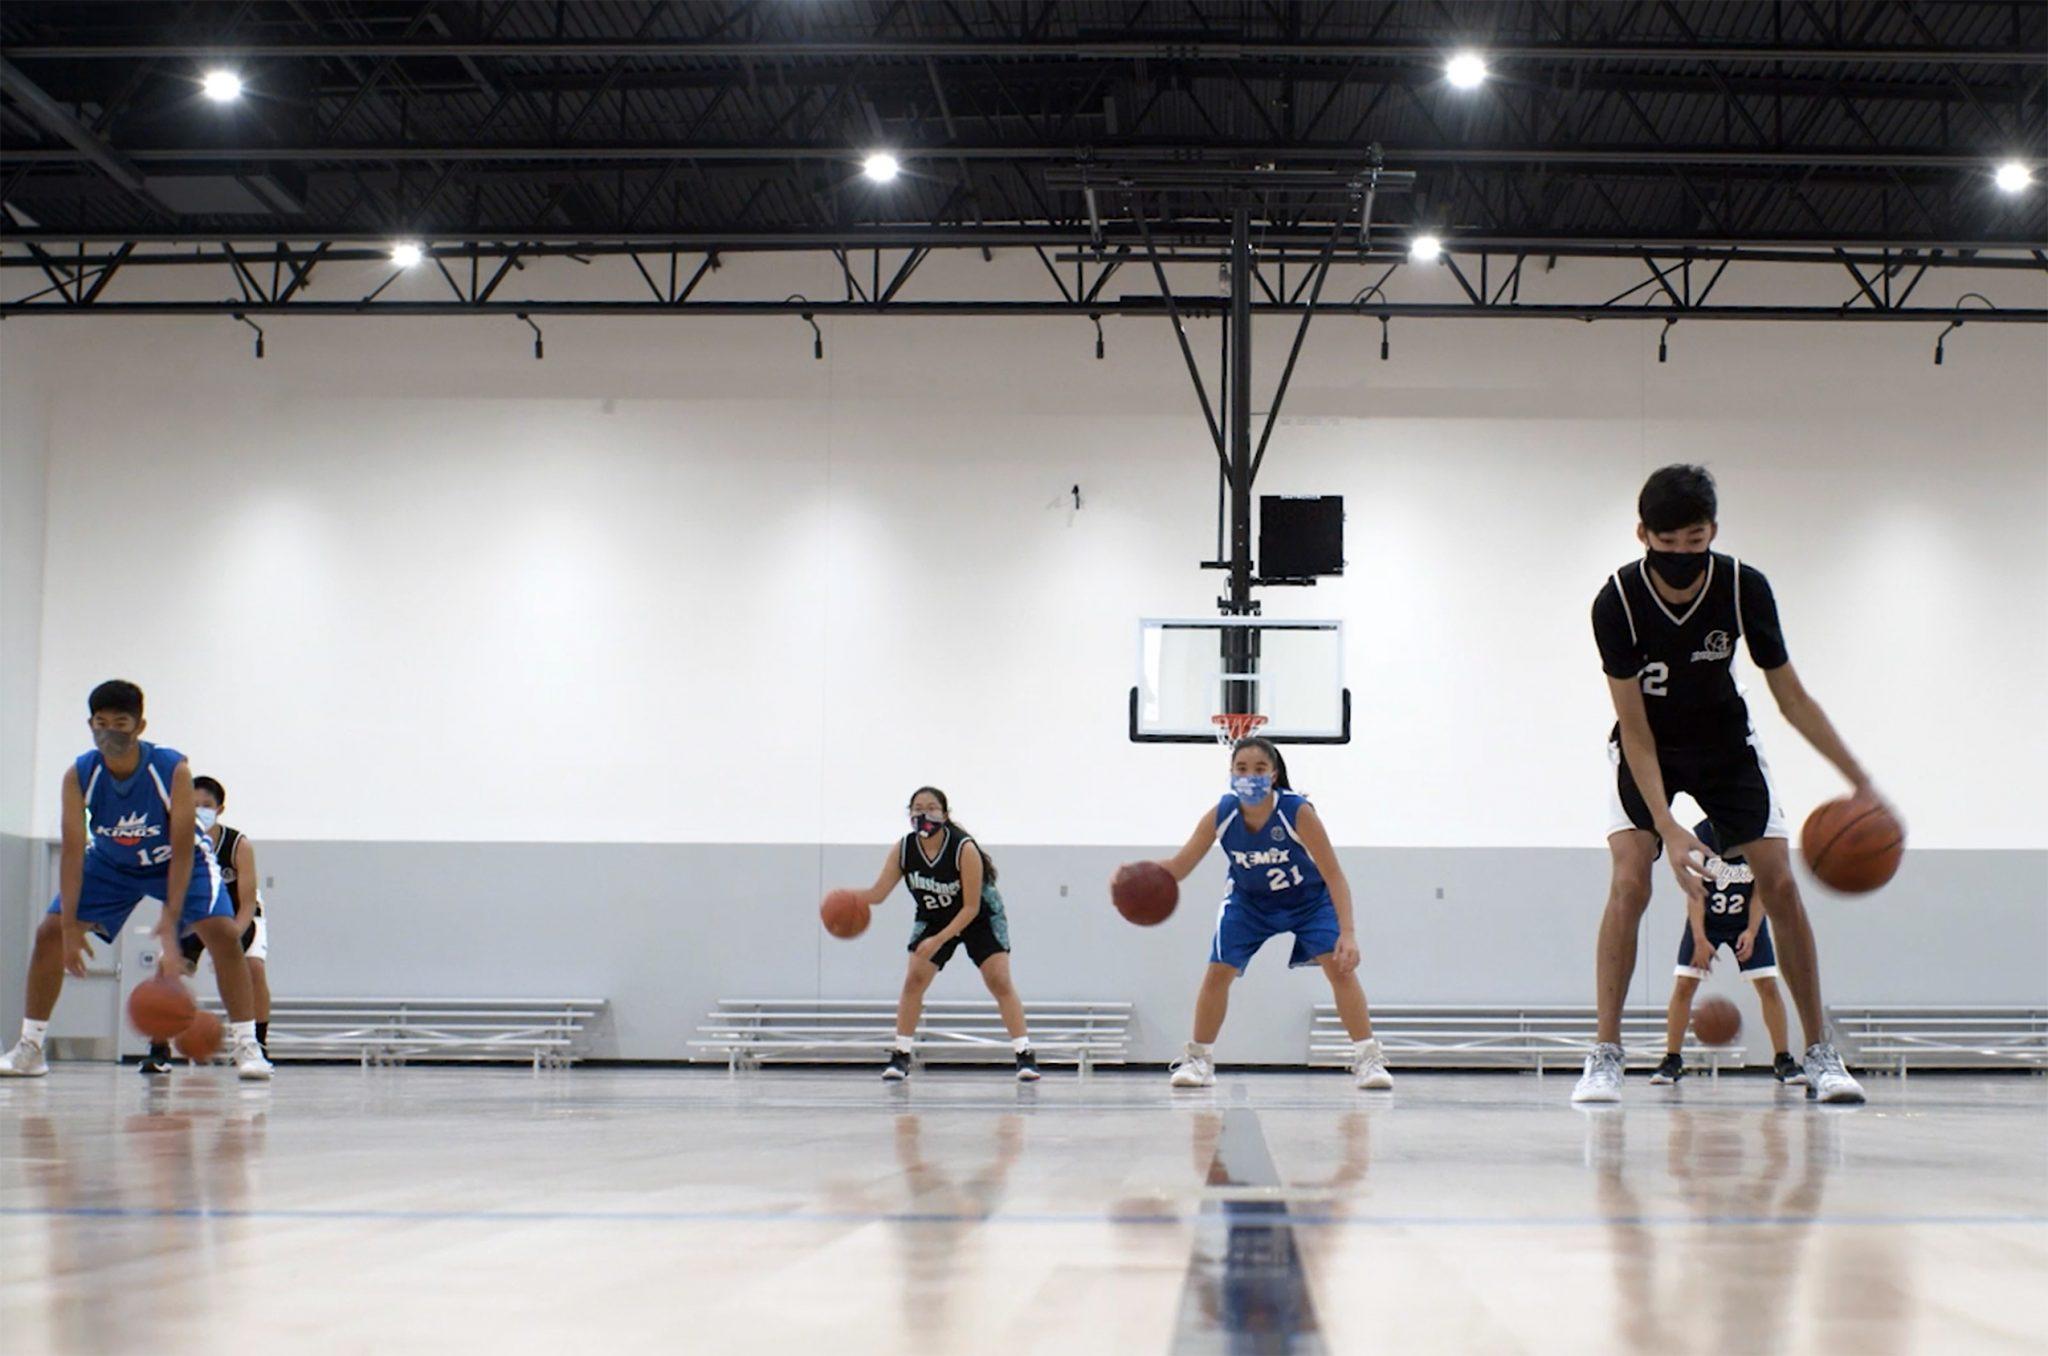 Youth dribbling basketballs in Budokan gym